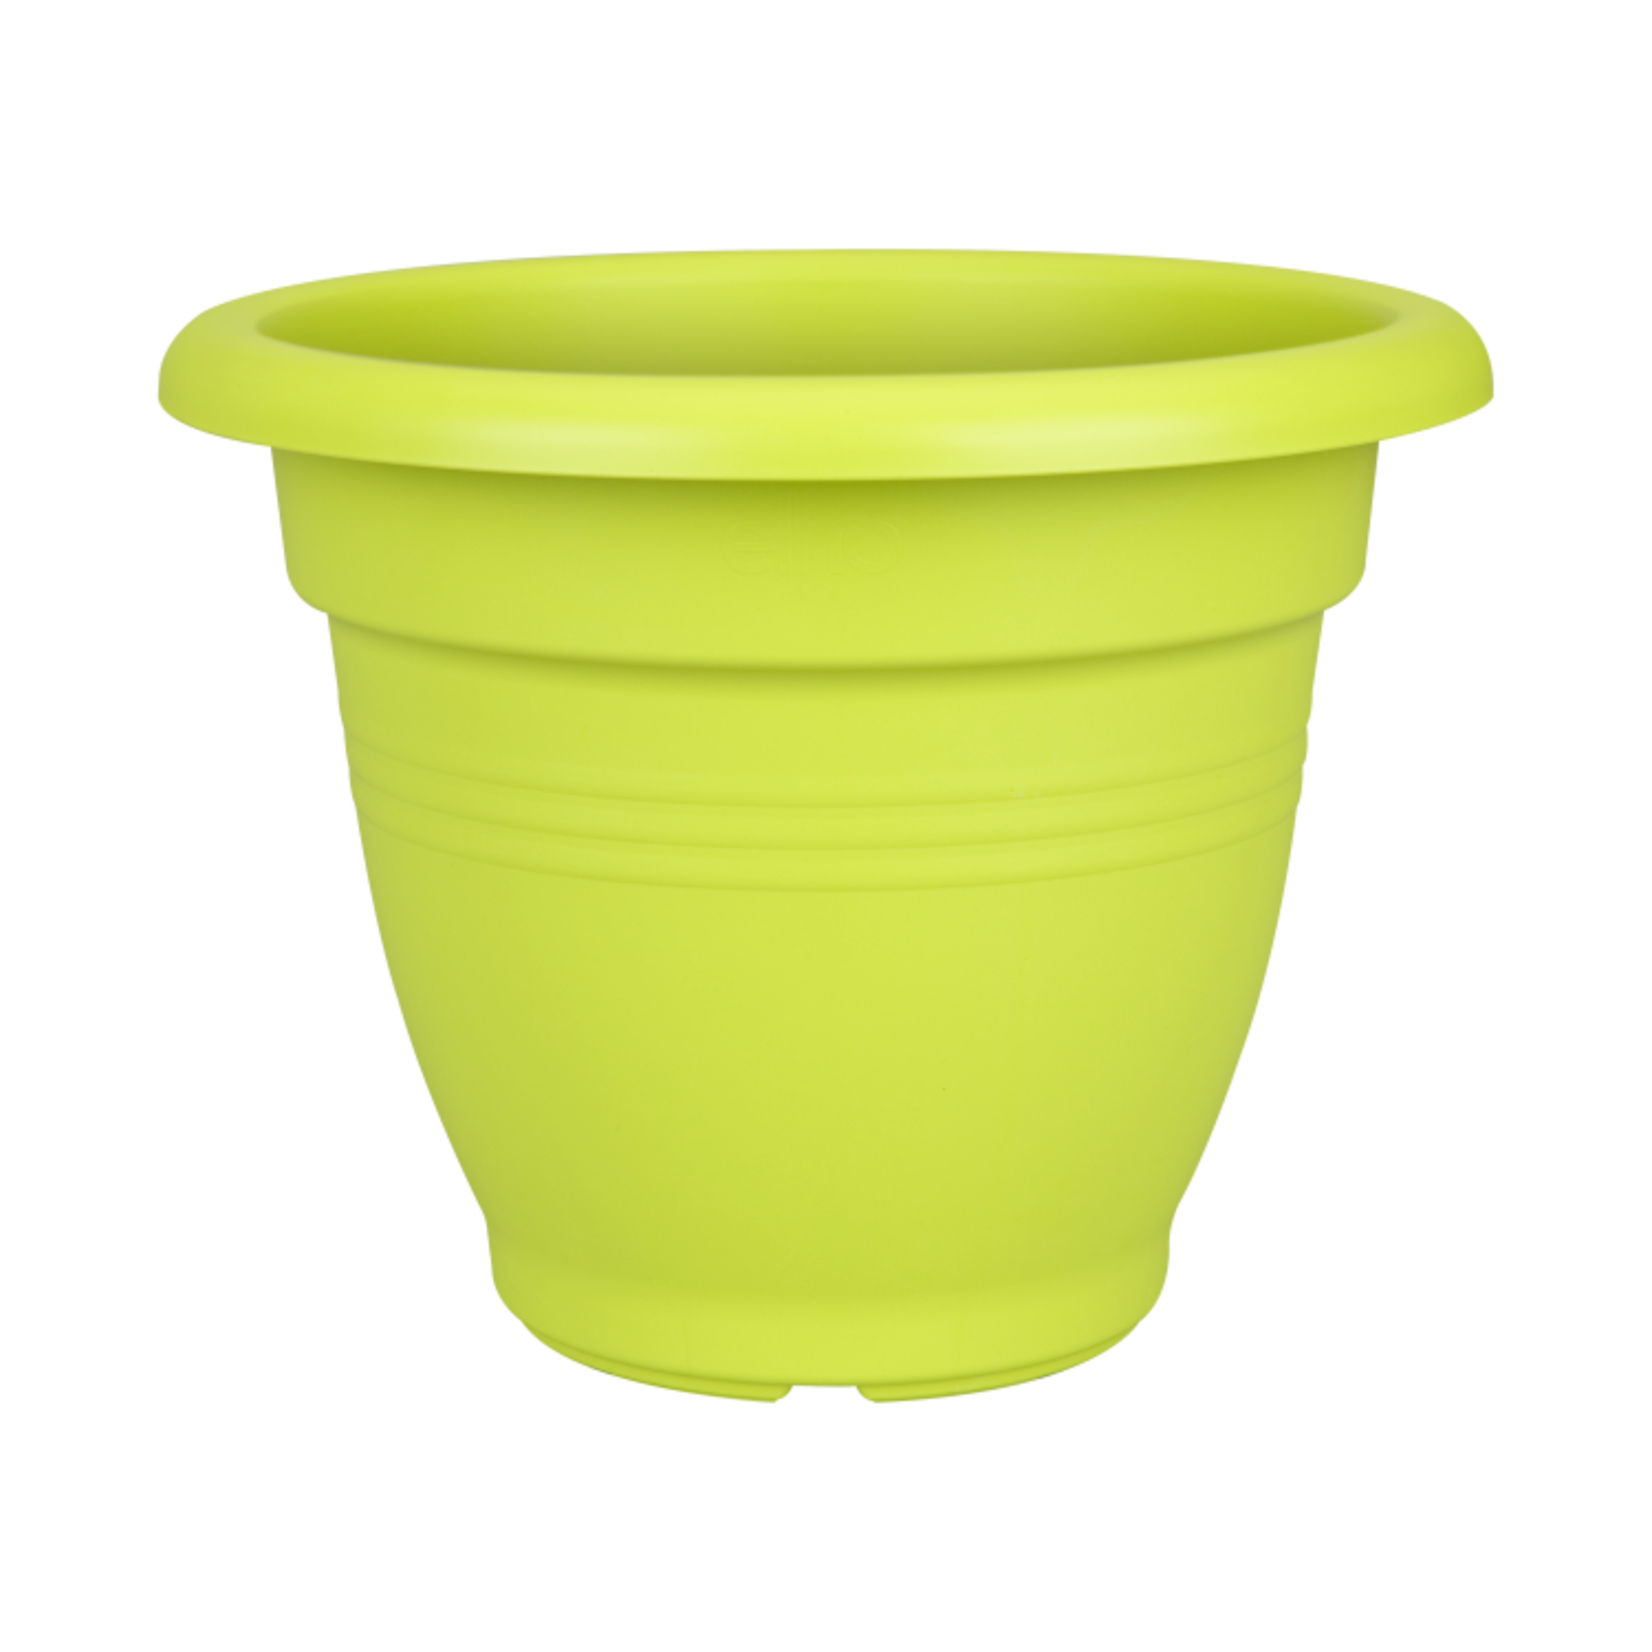 Elho Elho Green Basics Campana 30Cm - Lime Green